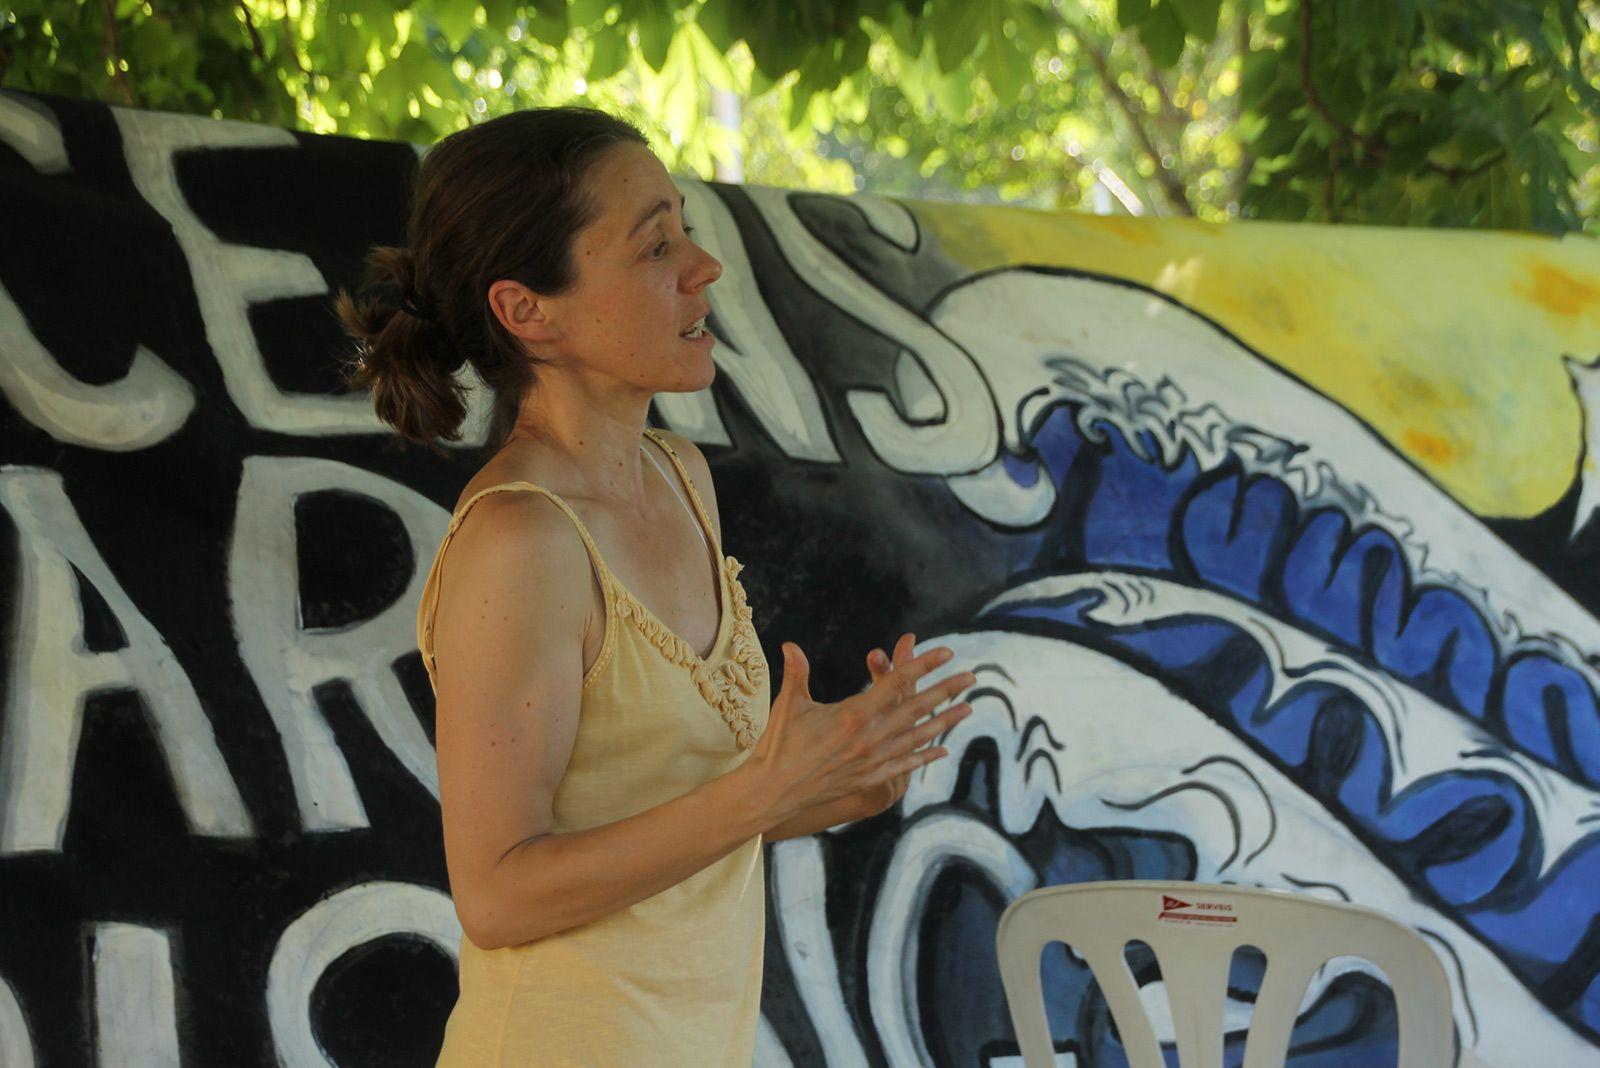 Xerrada d'ecologisme a la Festa Major Alternativa. FOTO: Paula Galván